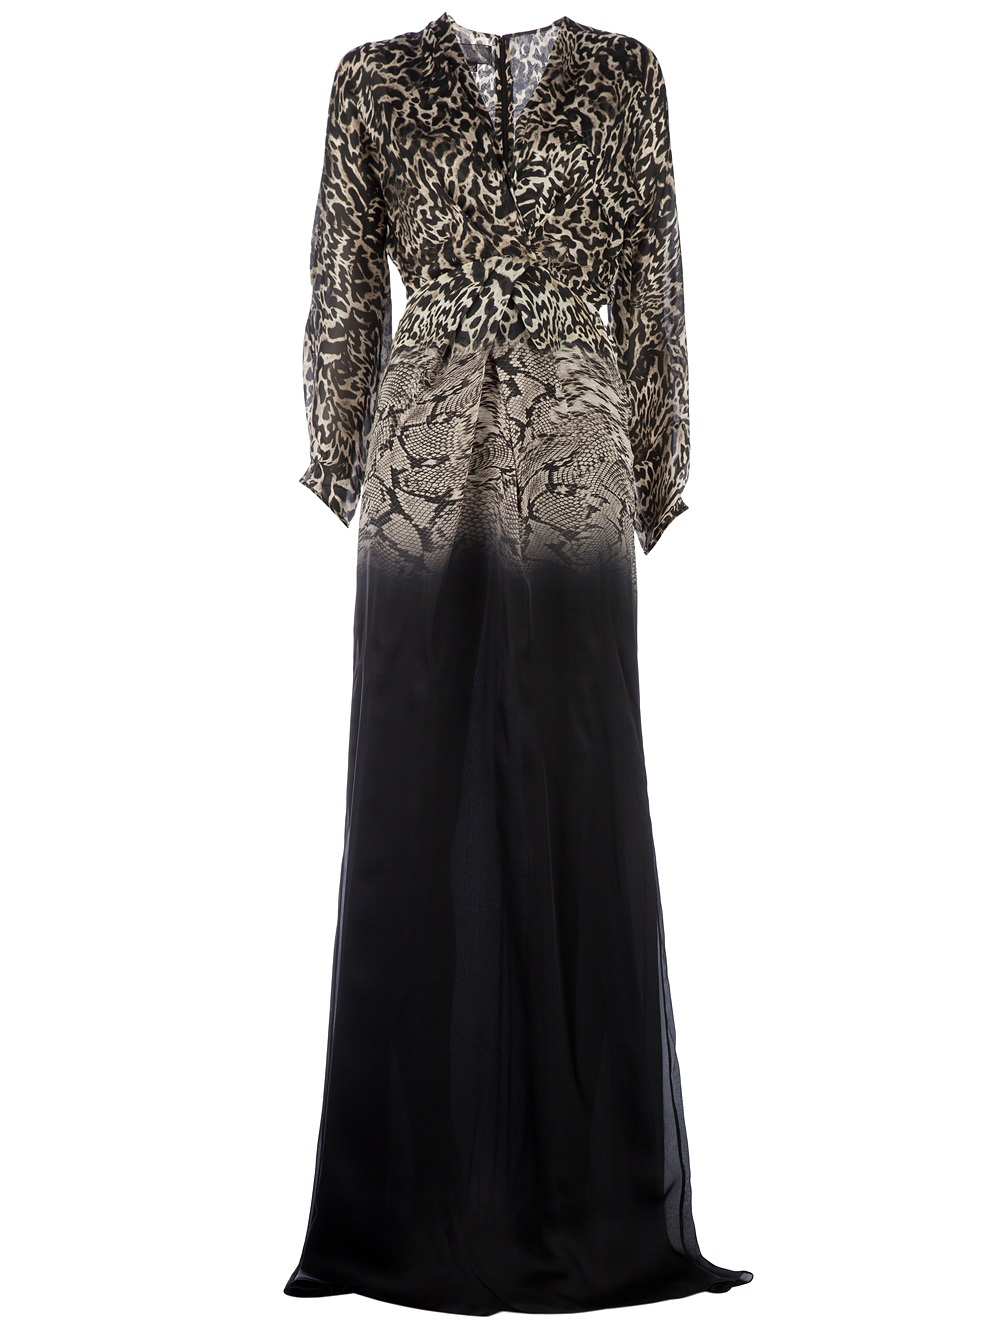 c17cf3422d Lyst - Giambattista Valli Animal Print Gown in Black